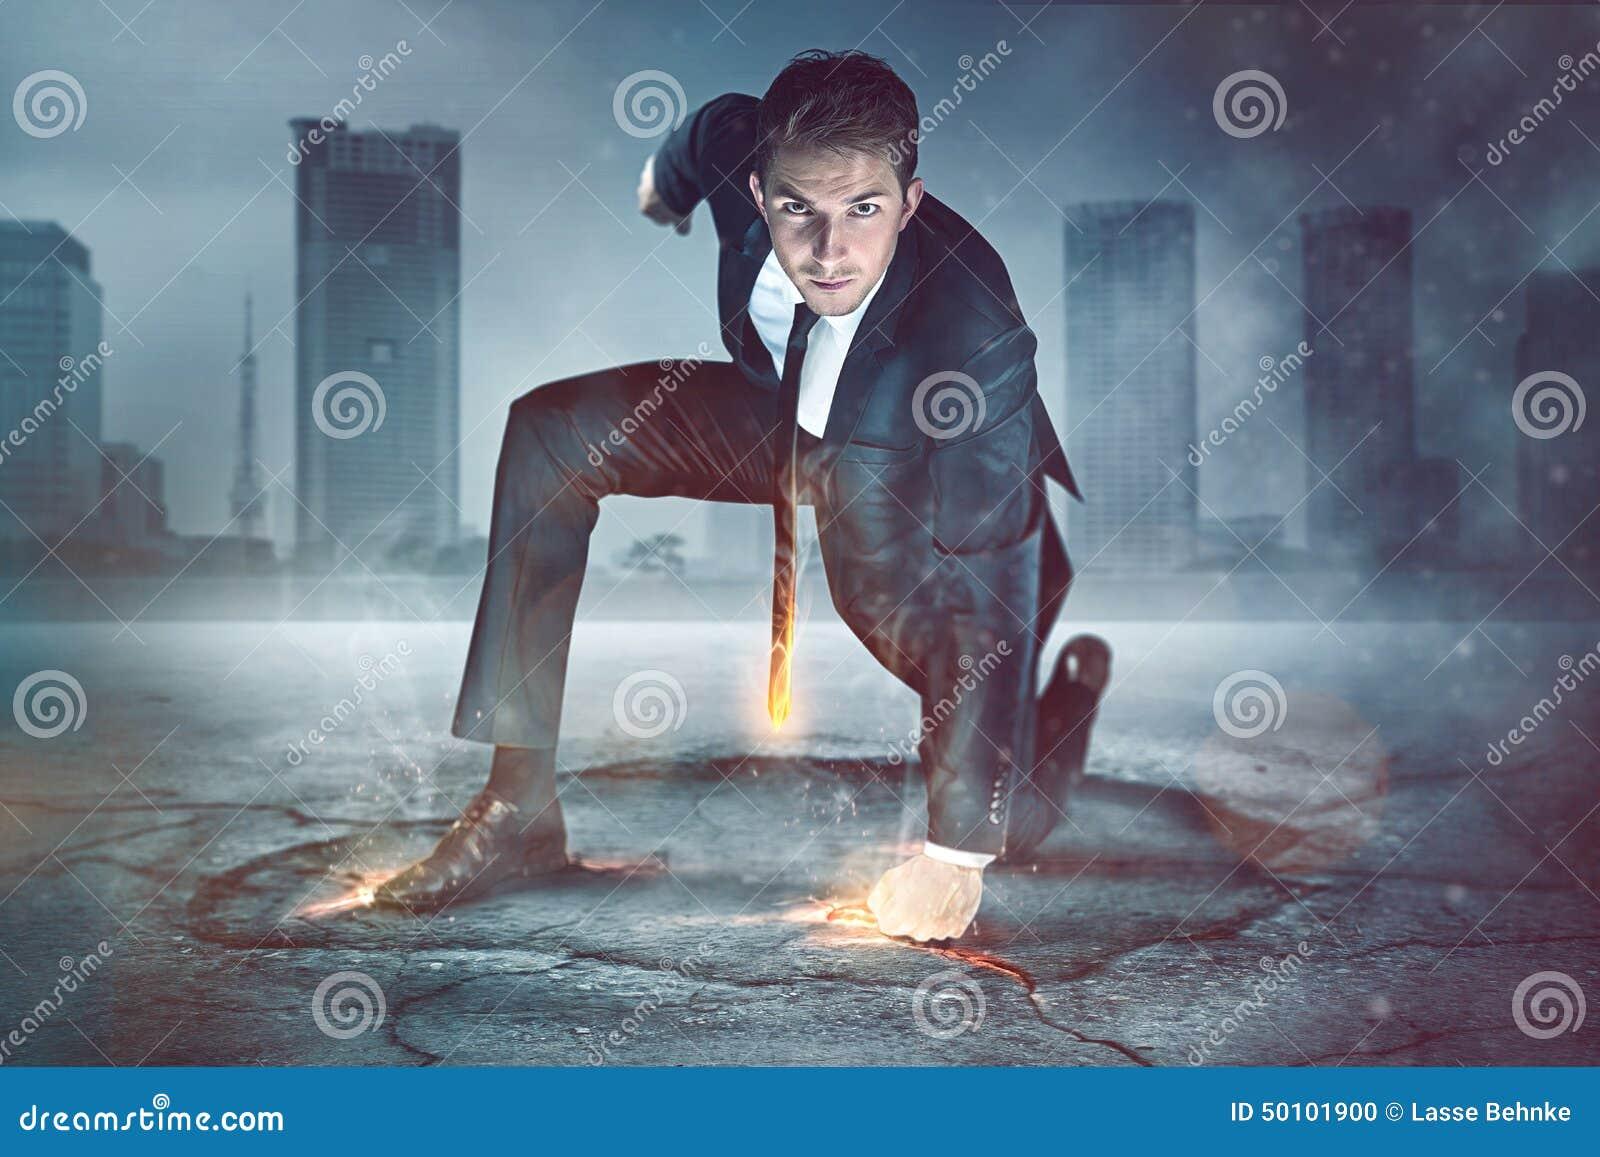 Businessman Superhero stock photo. Image of boss, city - 50101900